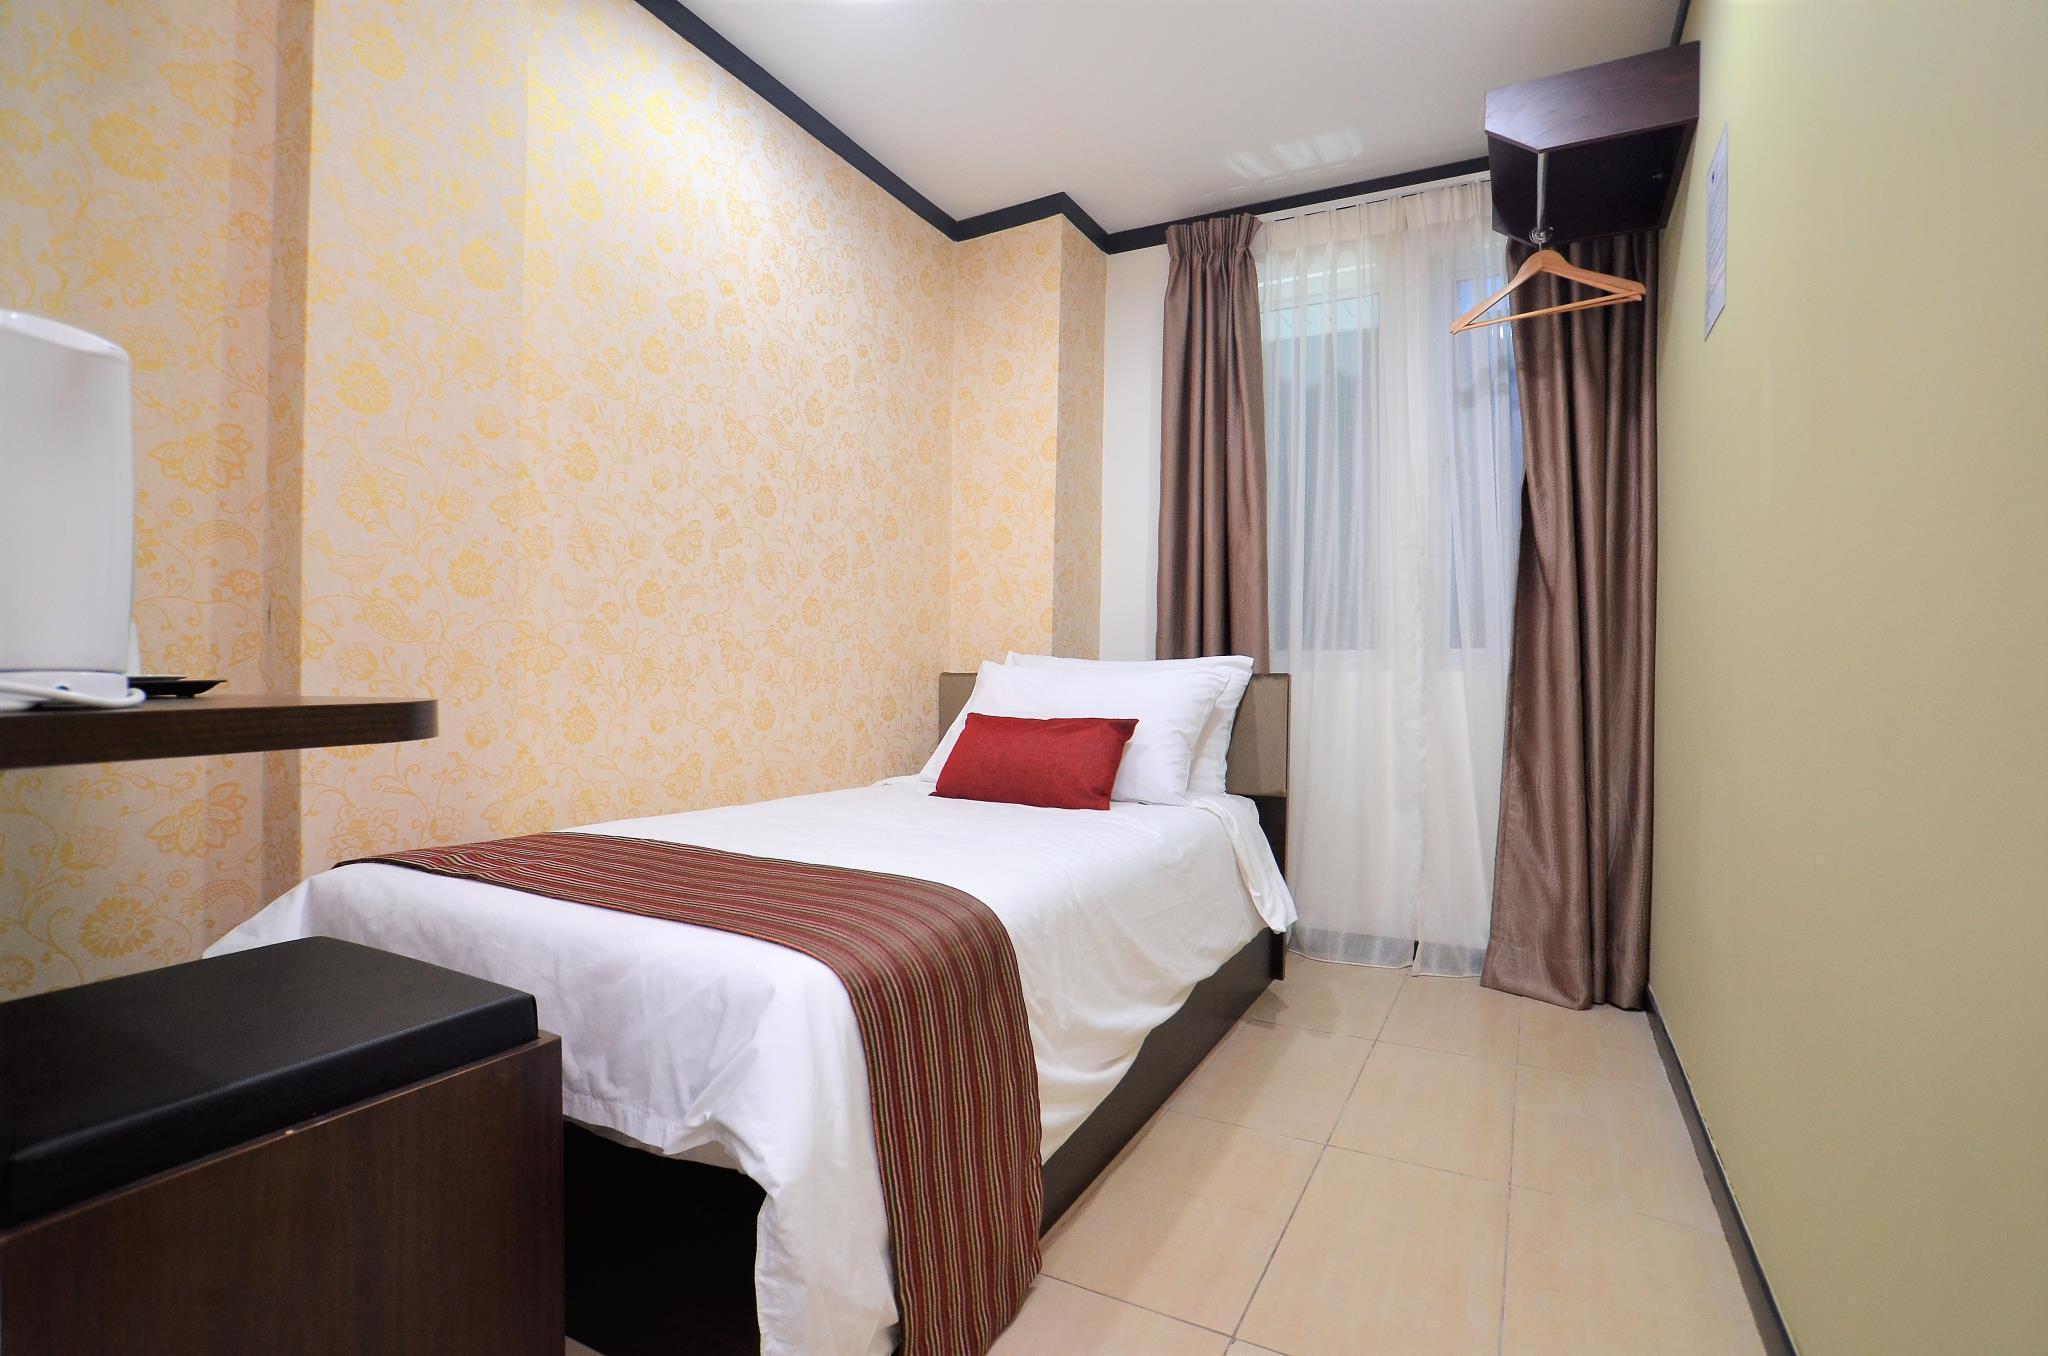 One Enigma Hotel Chowkit Putra Wtc Kuala Lumpur Mulai